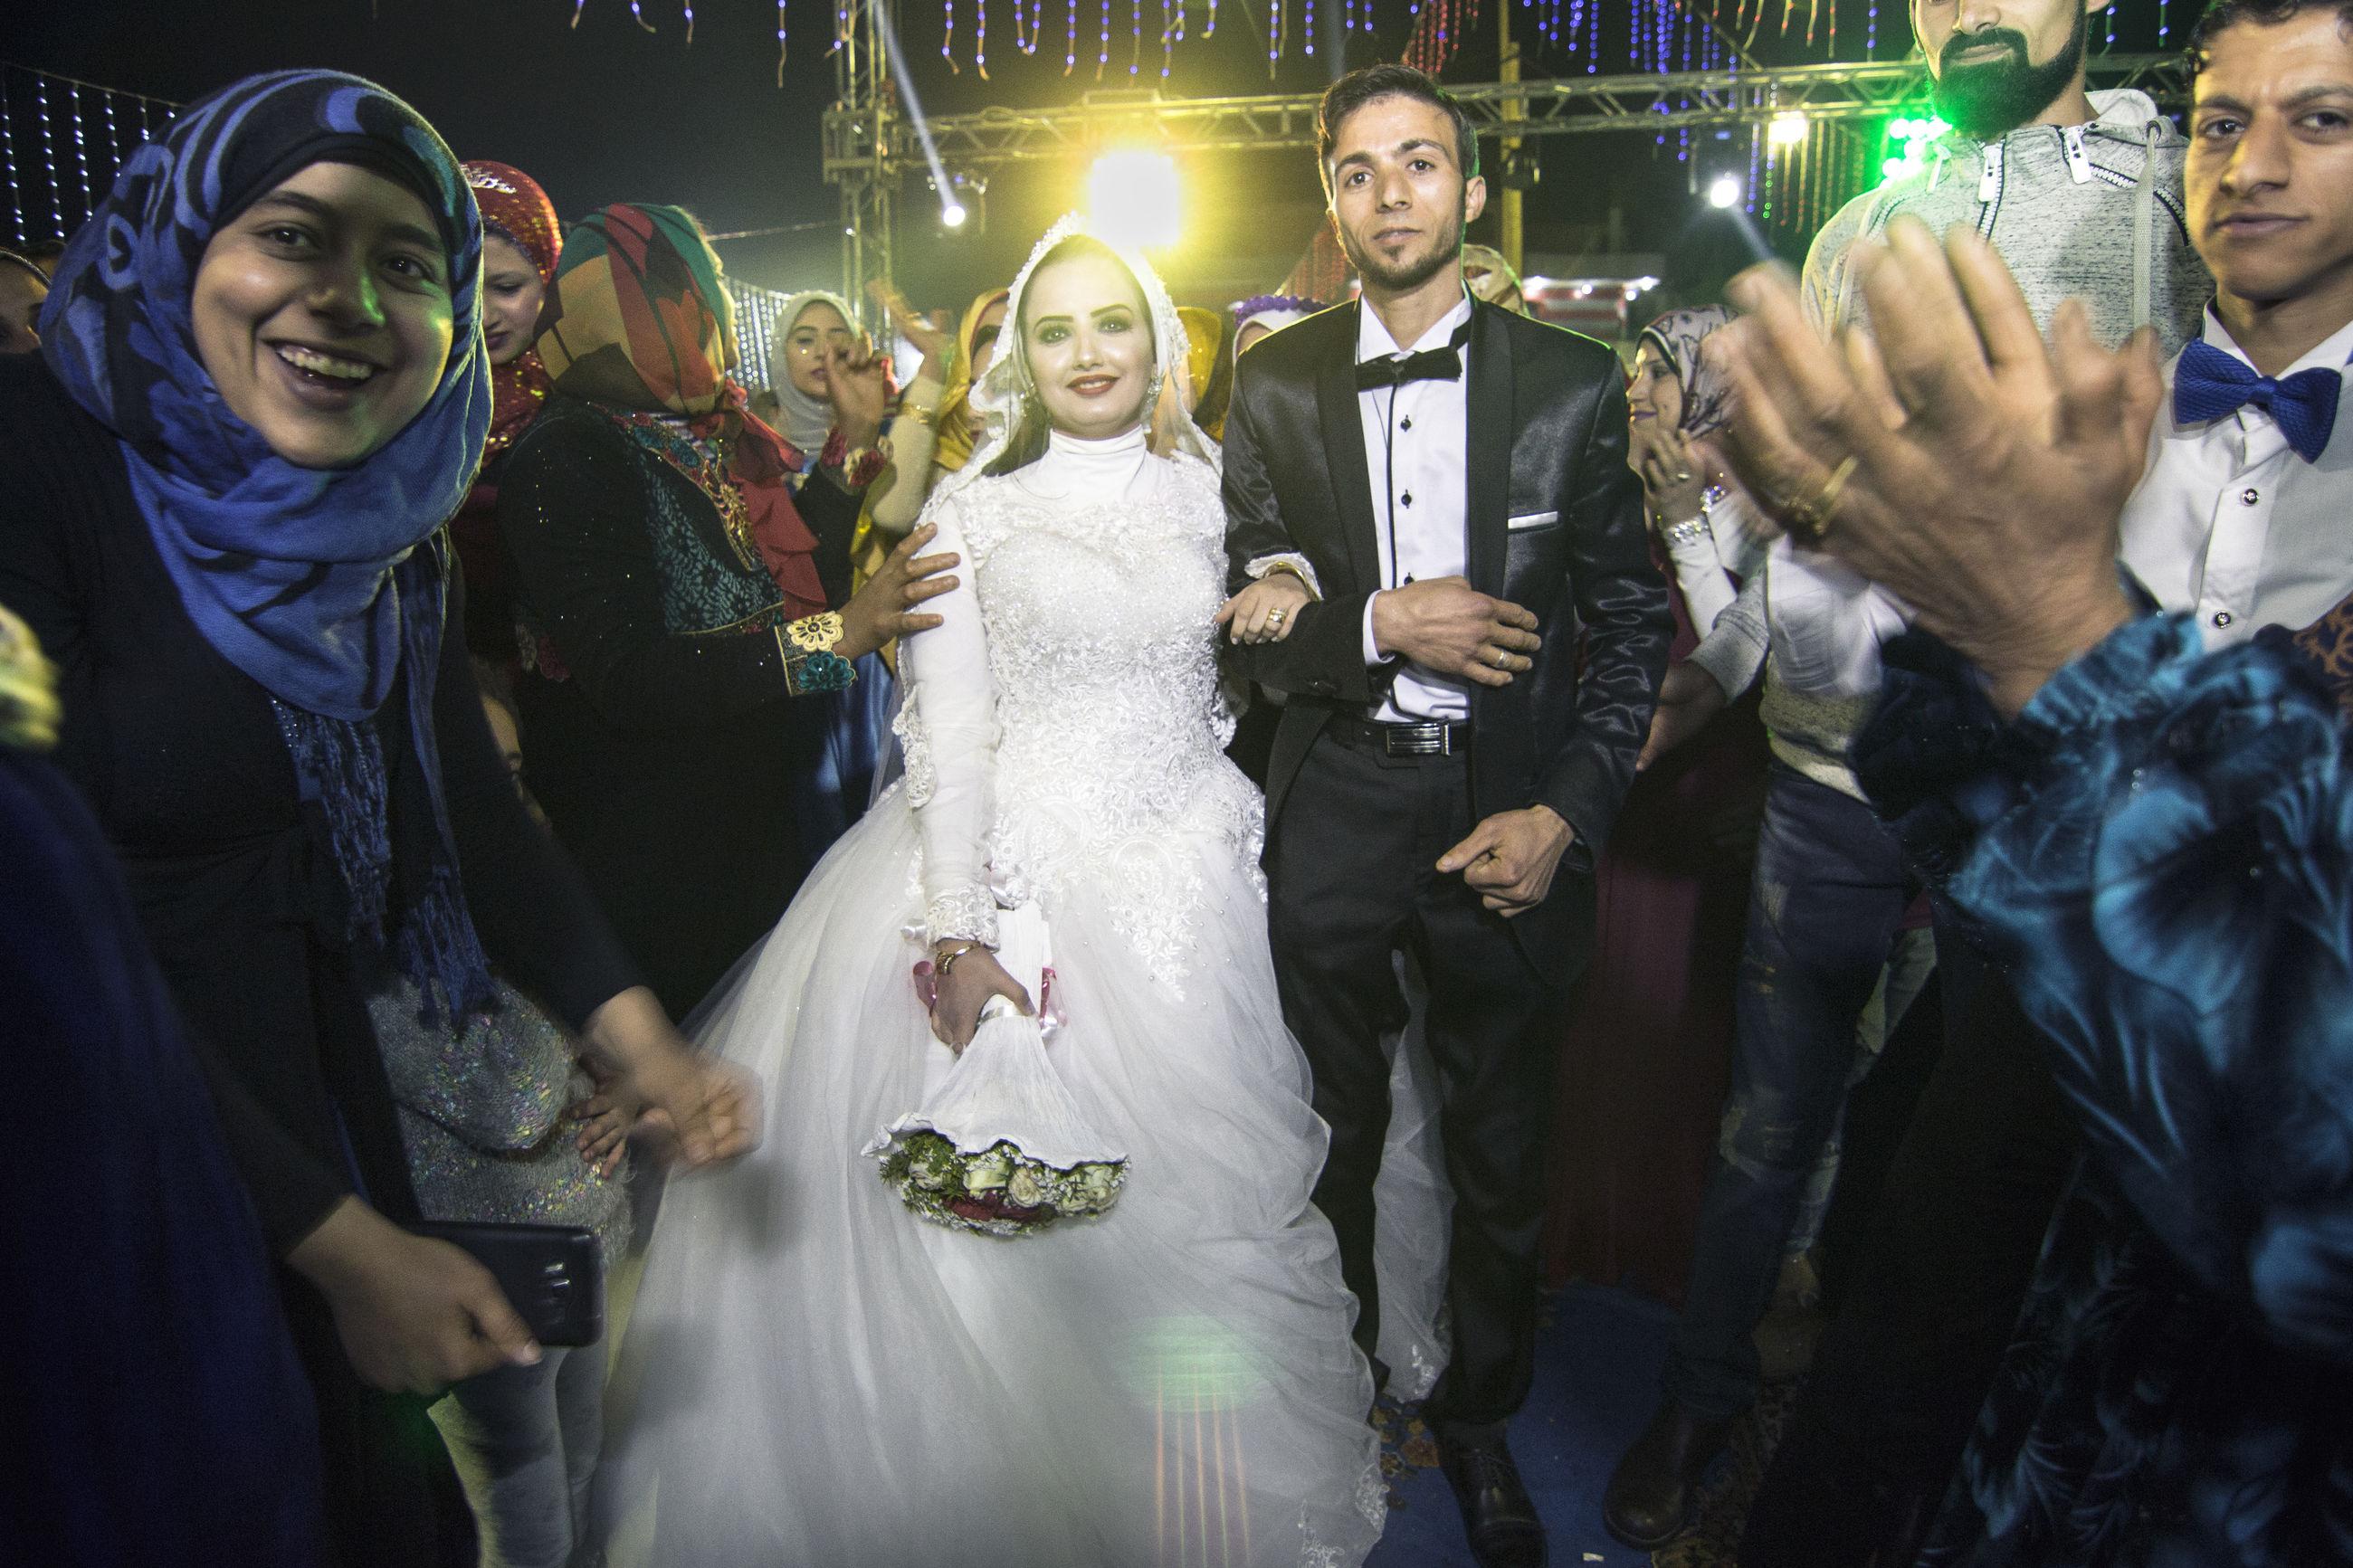 wedding, bride, celebration, togetherness, men, love, wedding dress, bridegroom, tuxedo, life events, medium group of people, night, well-dressed, women, illuminated, young adult, standing, bonding, young women, indoors, adult, people